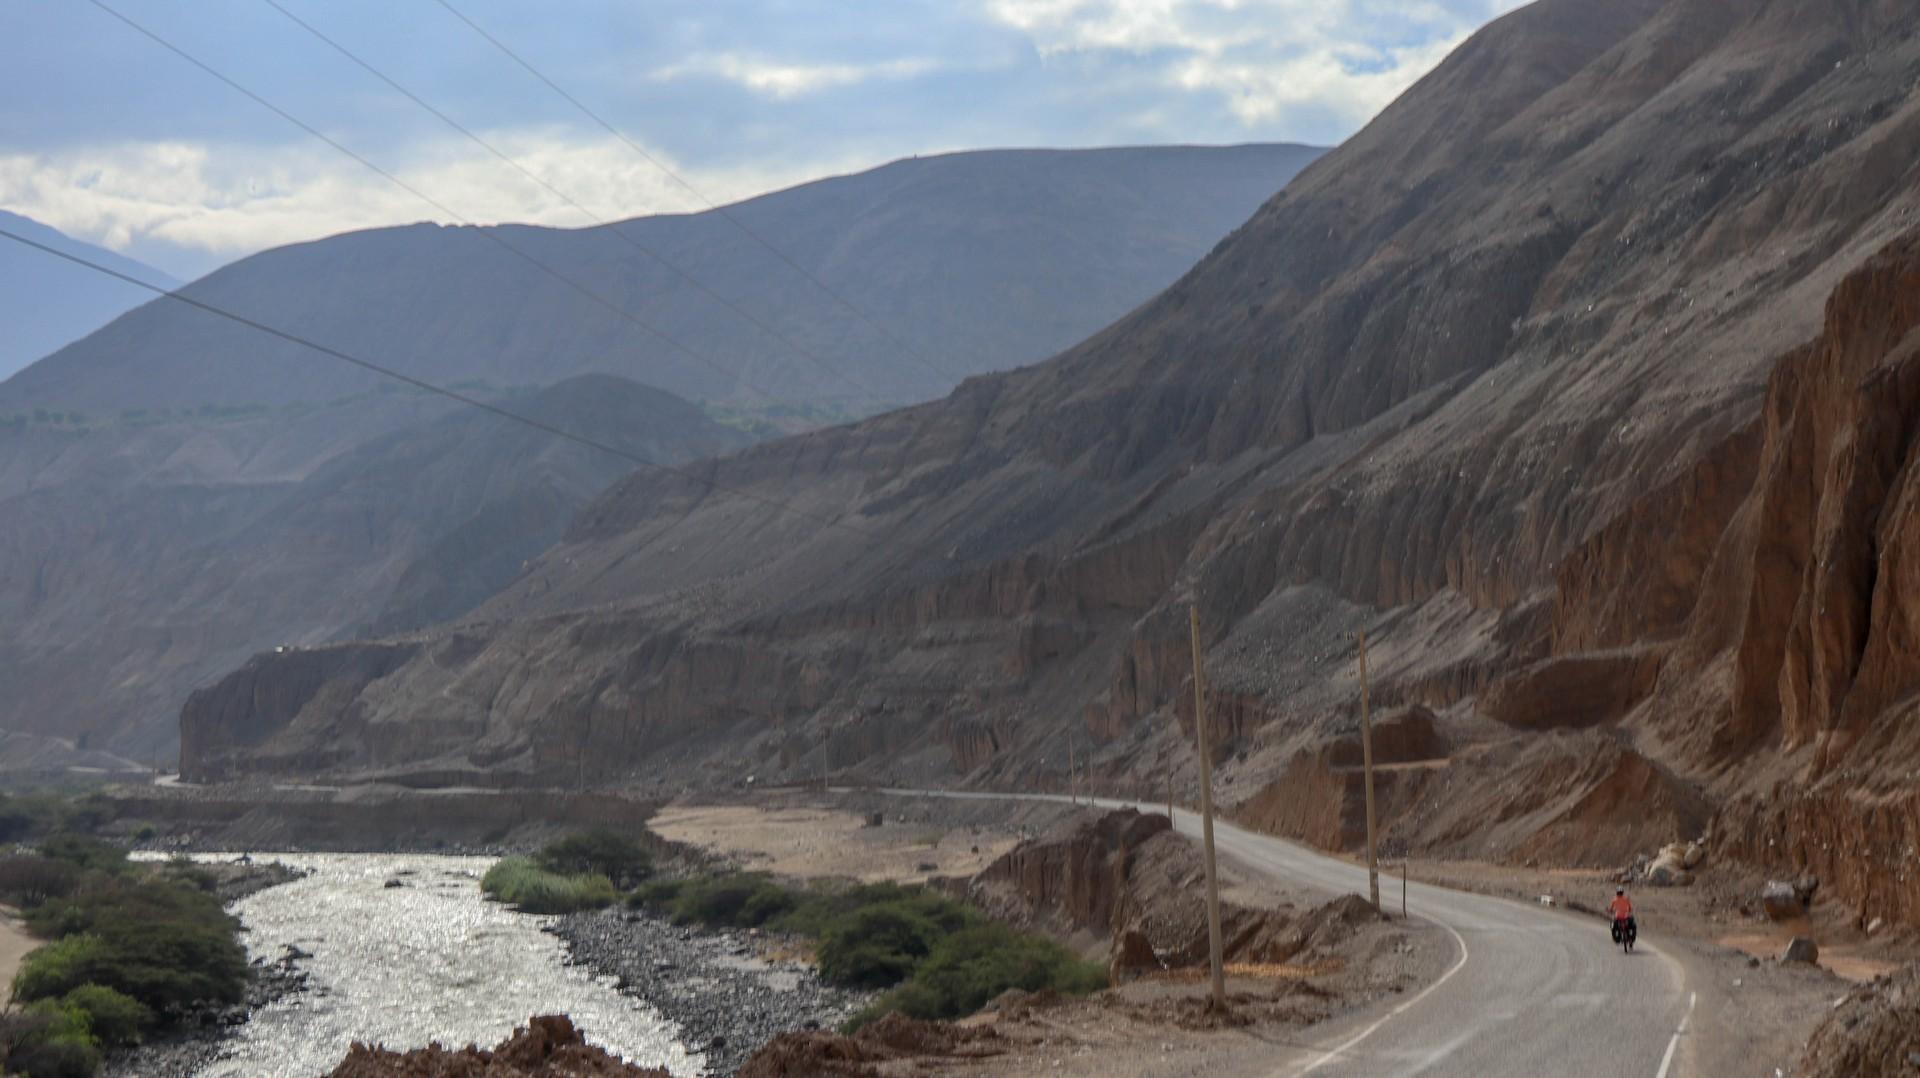 2019-05-05 Chuquimarca_Yuracmarca-24